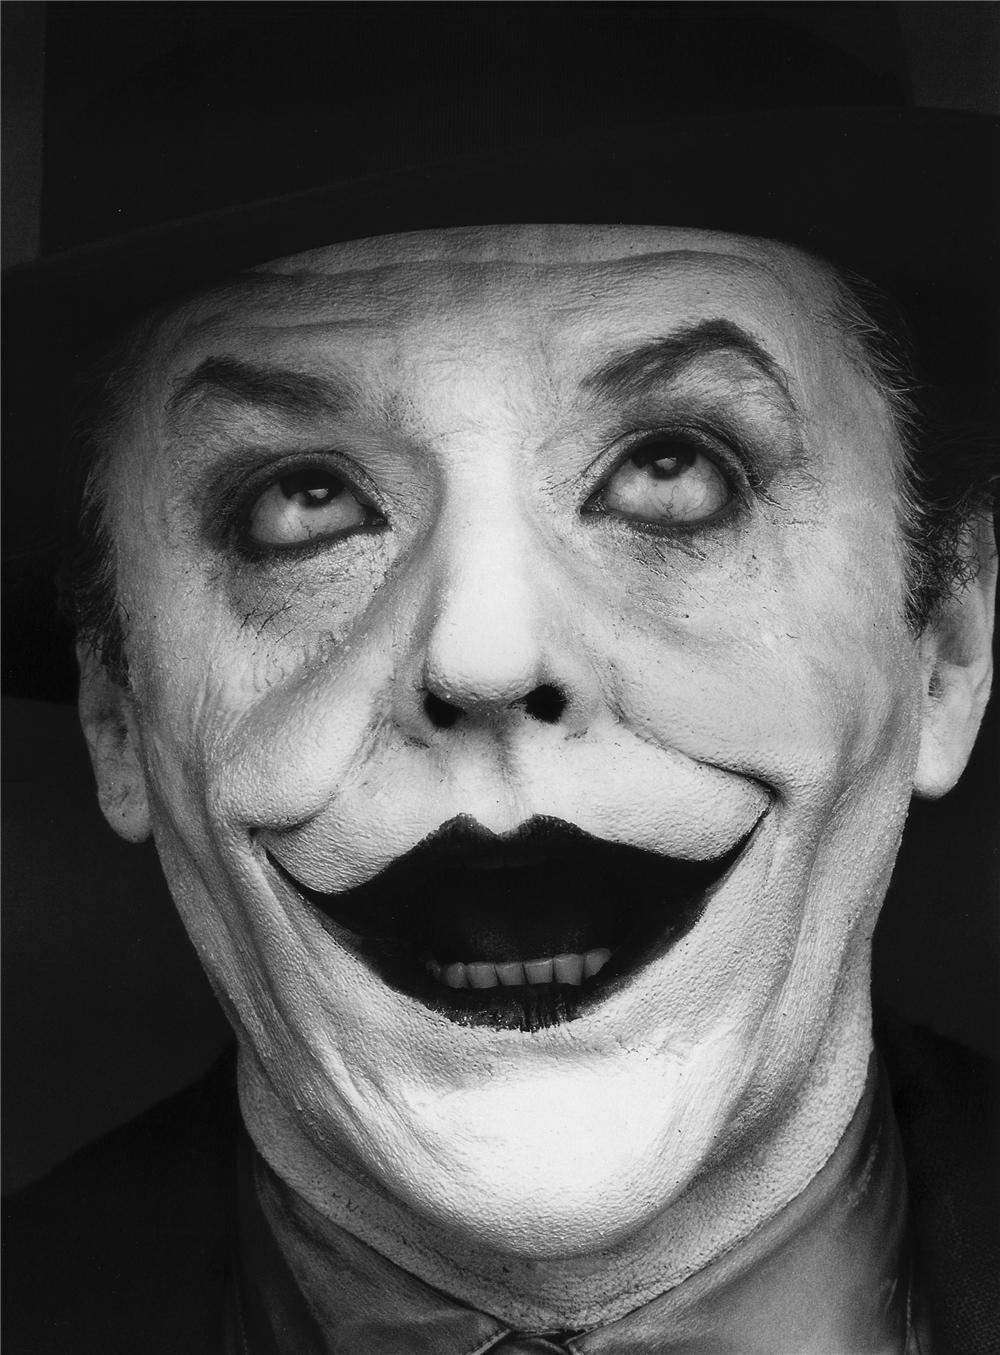 Imagenes de Jack Nicholson